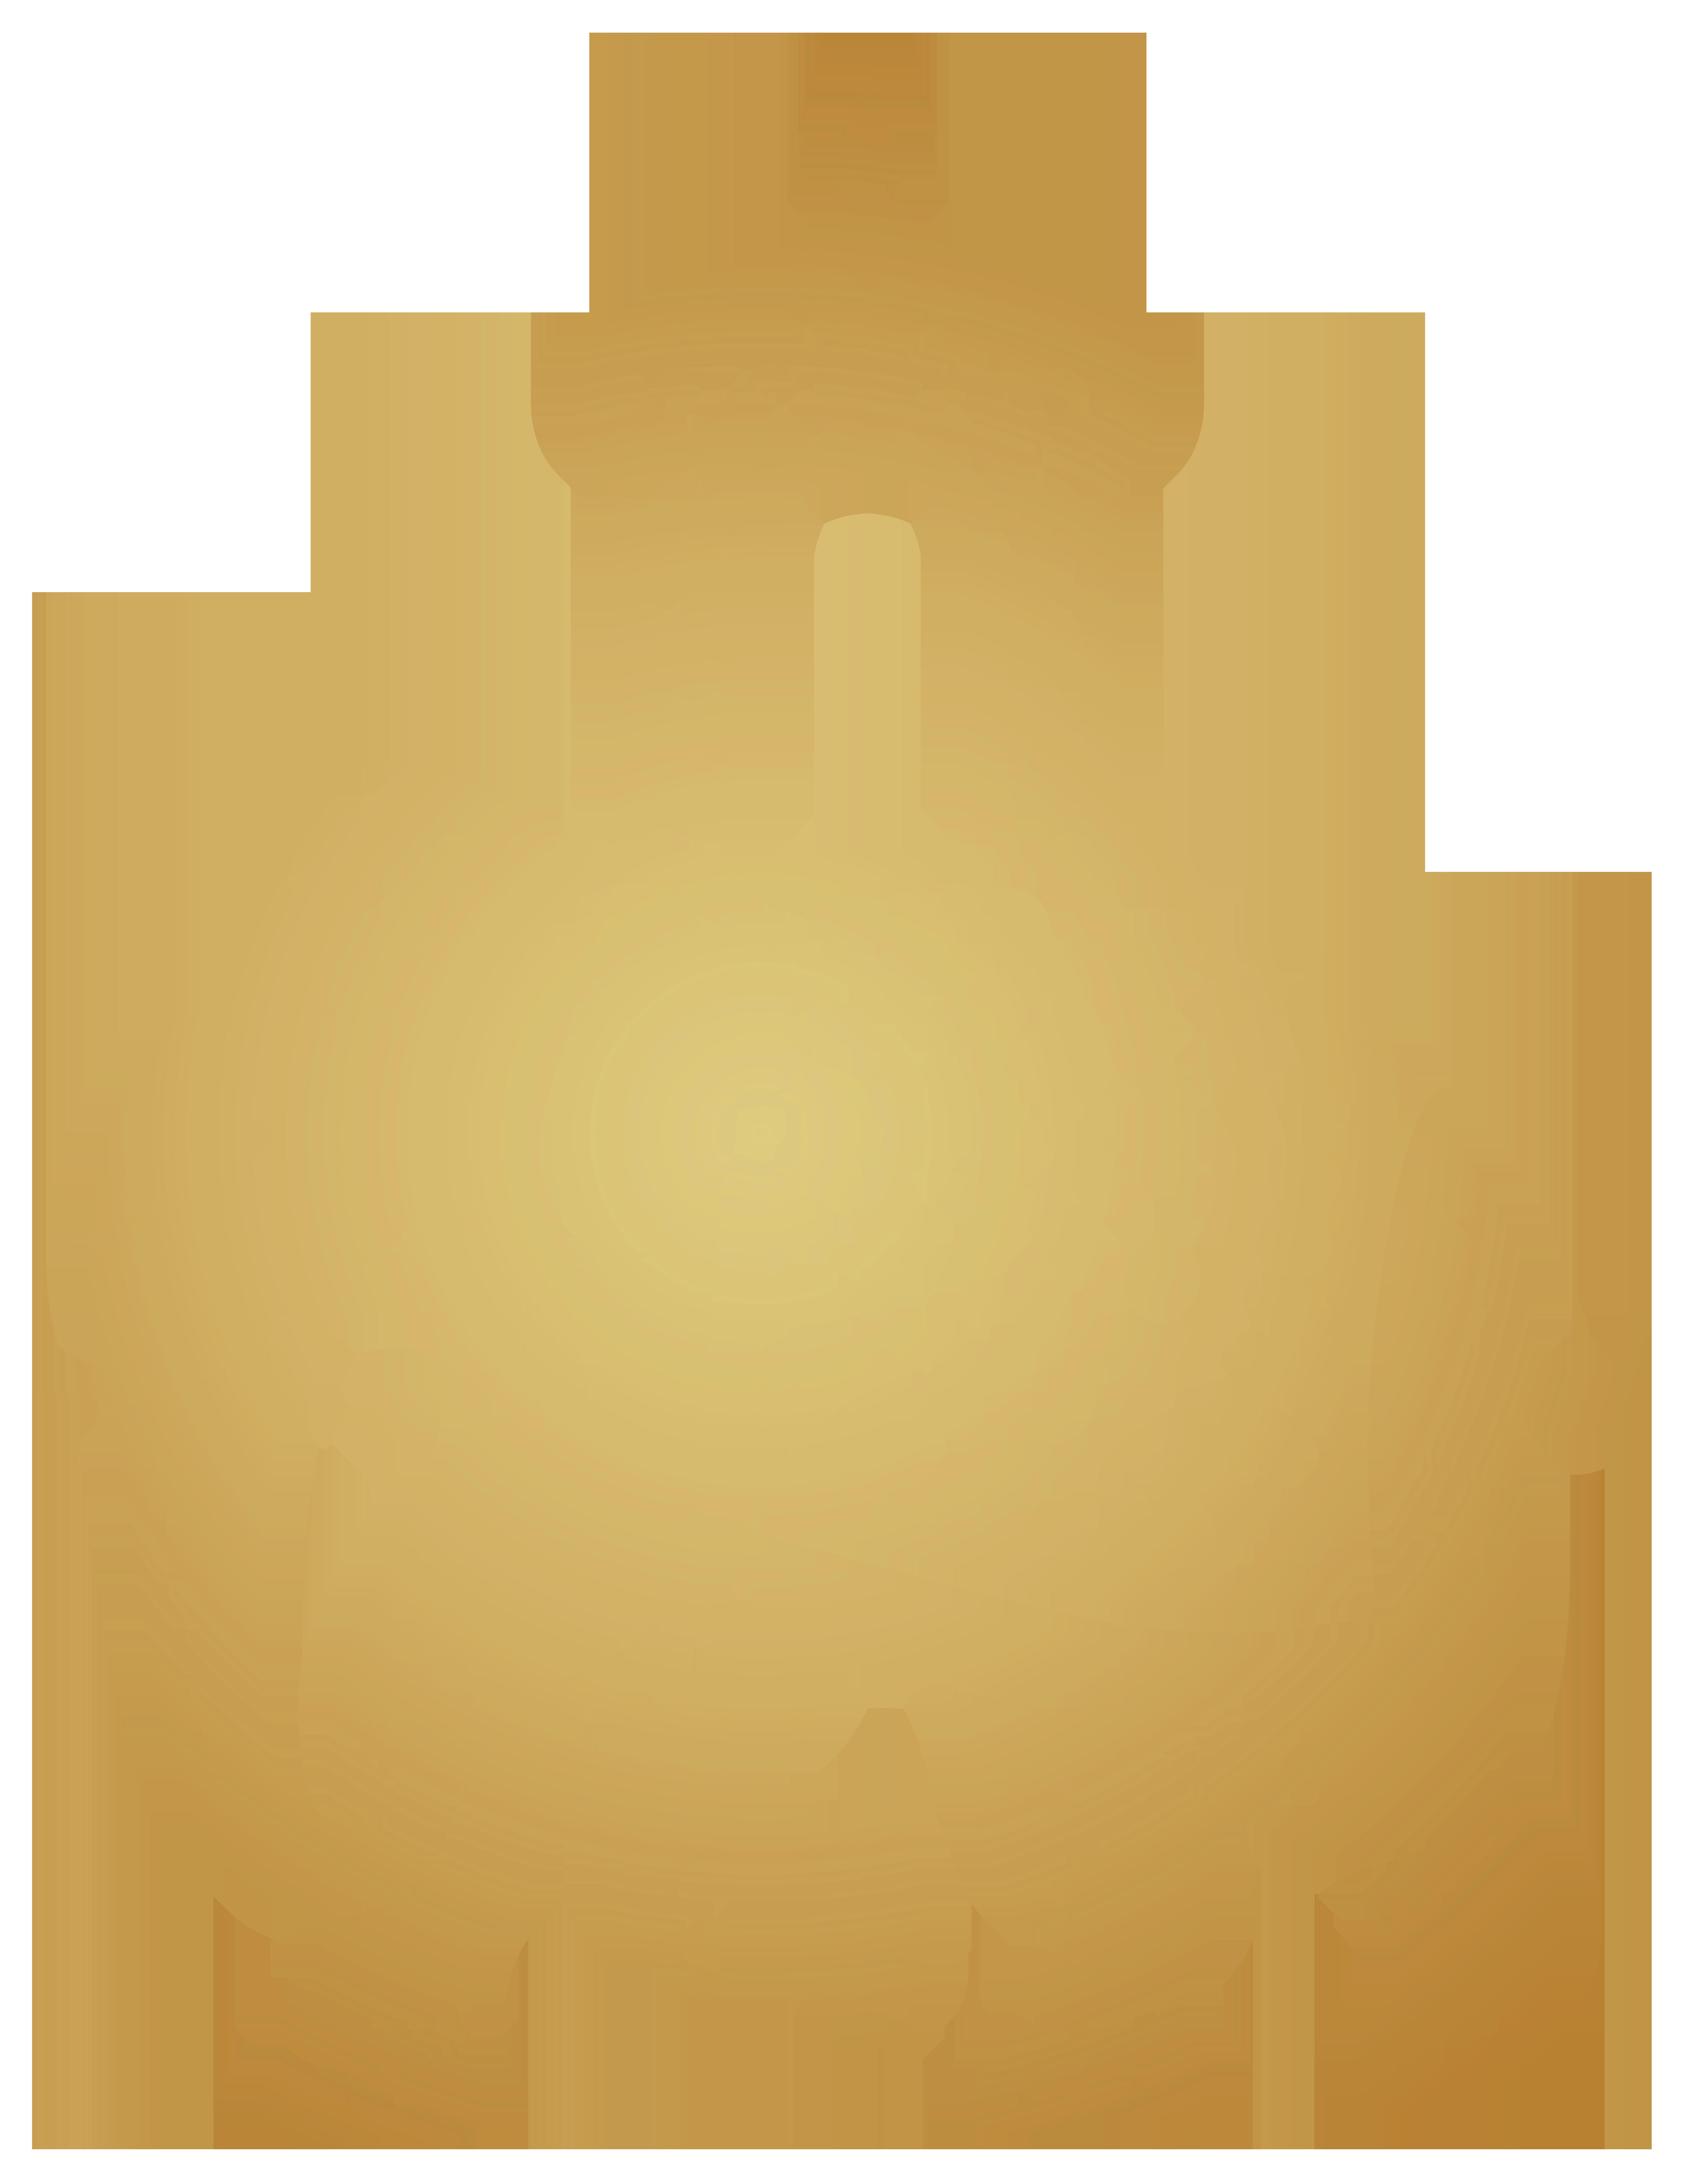 Wedding clipart elephant Traditional com clipart Indian logo